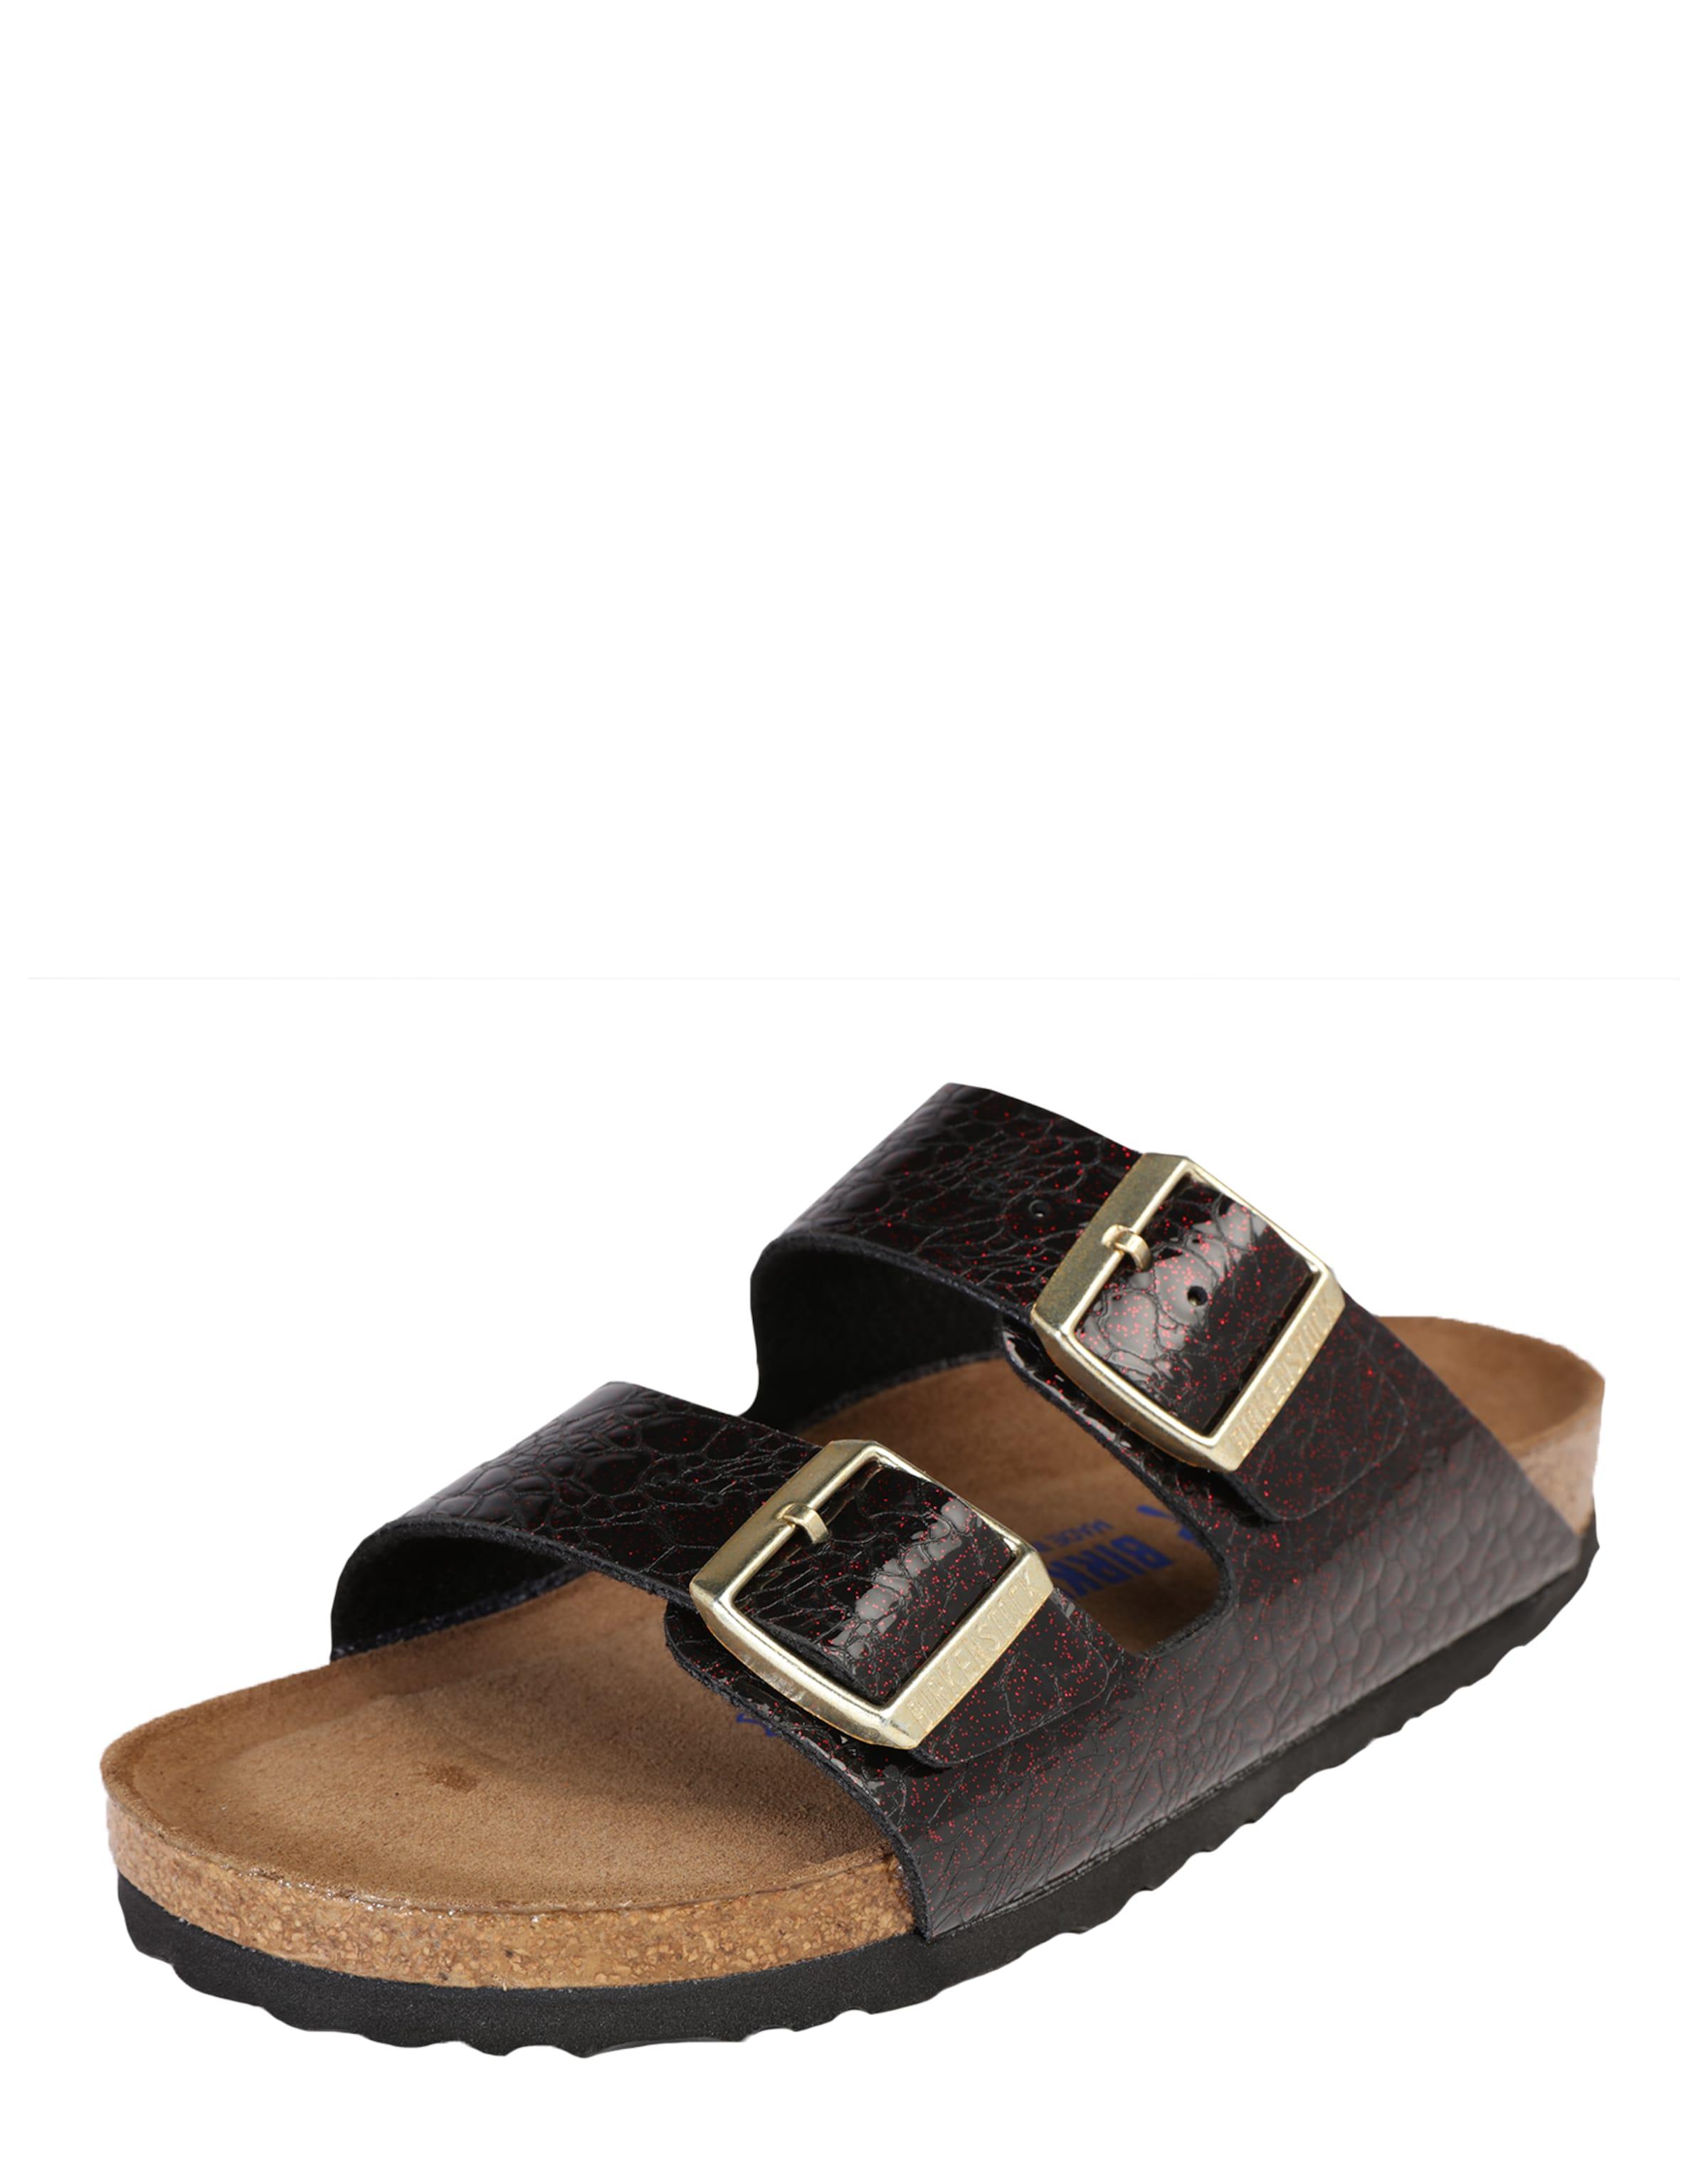 BIRKENSTOCK Pantolette Arizona schmal Verschleißfeste billige Schuhe